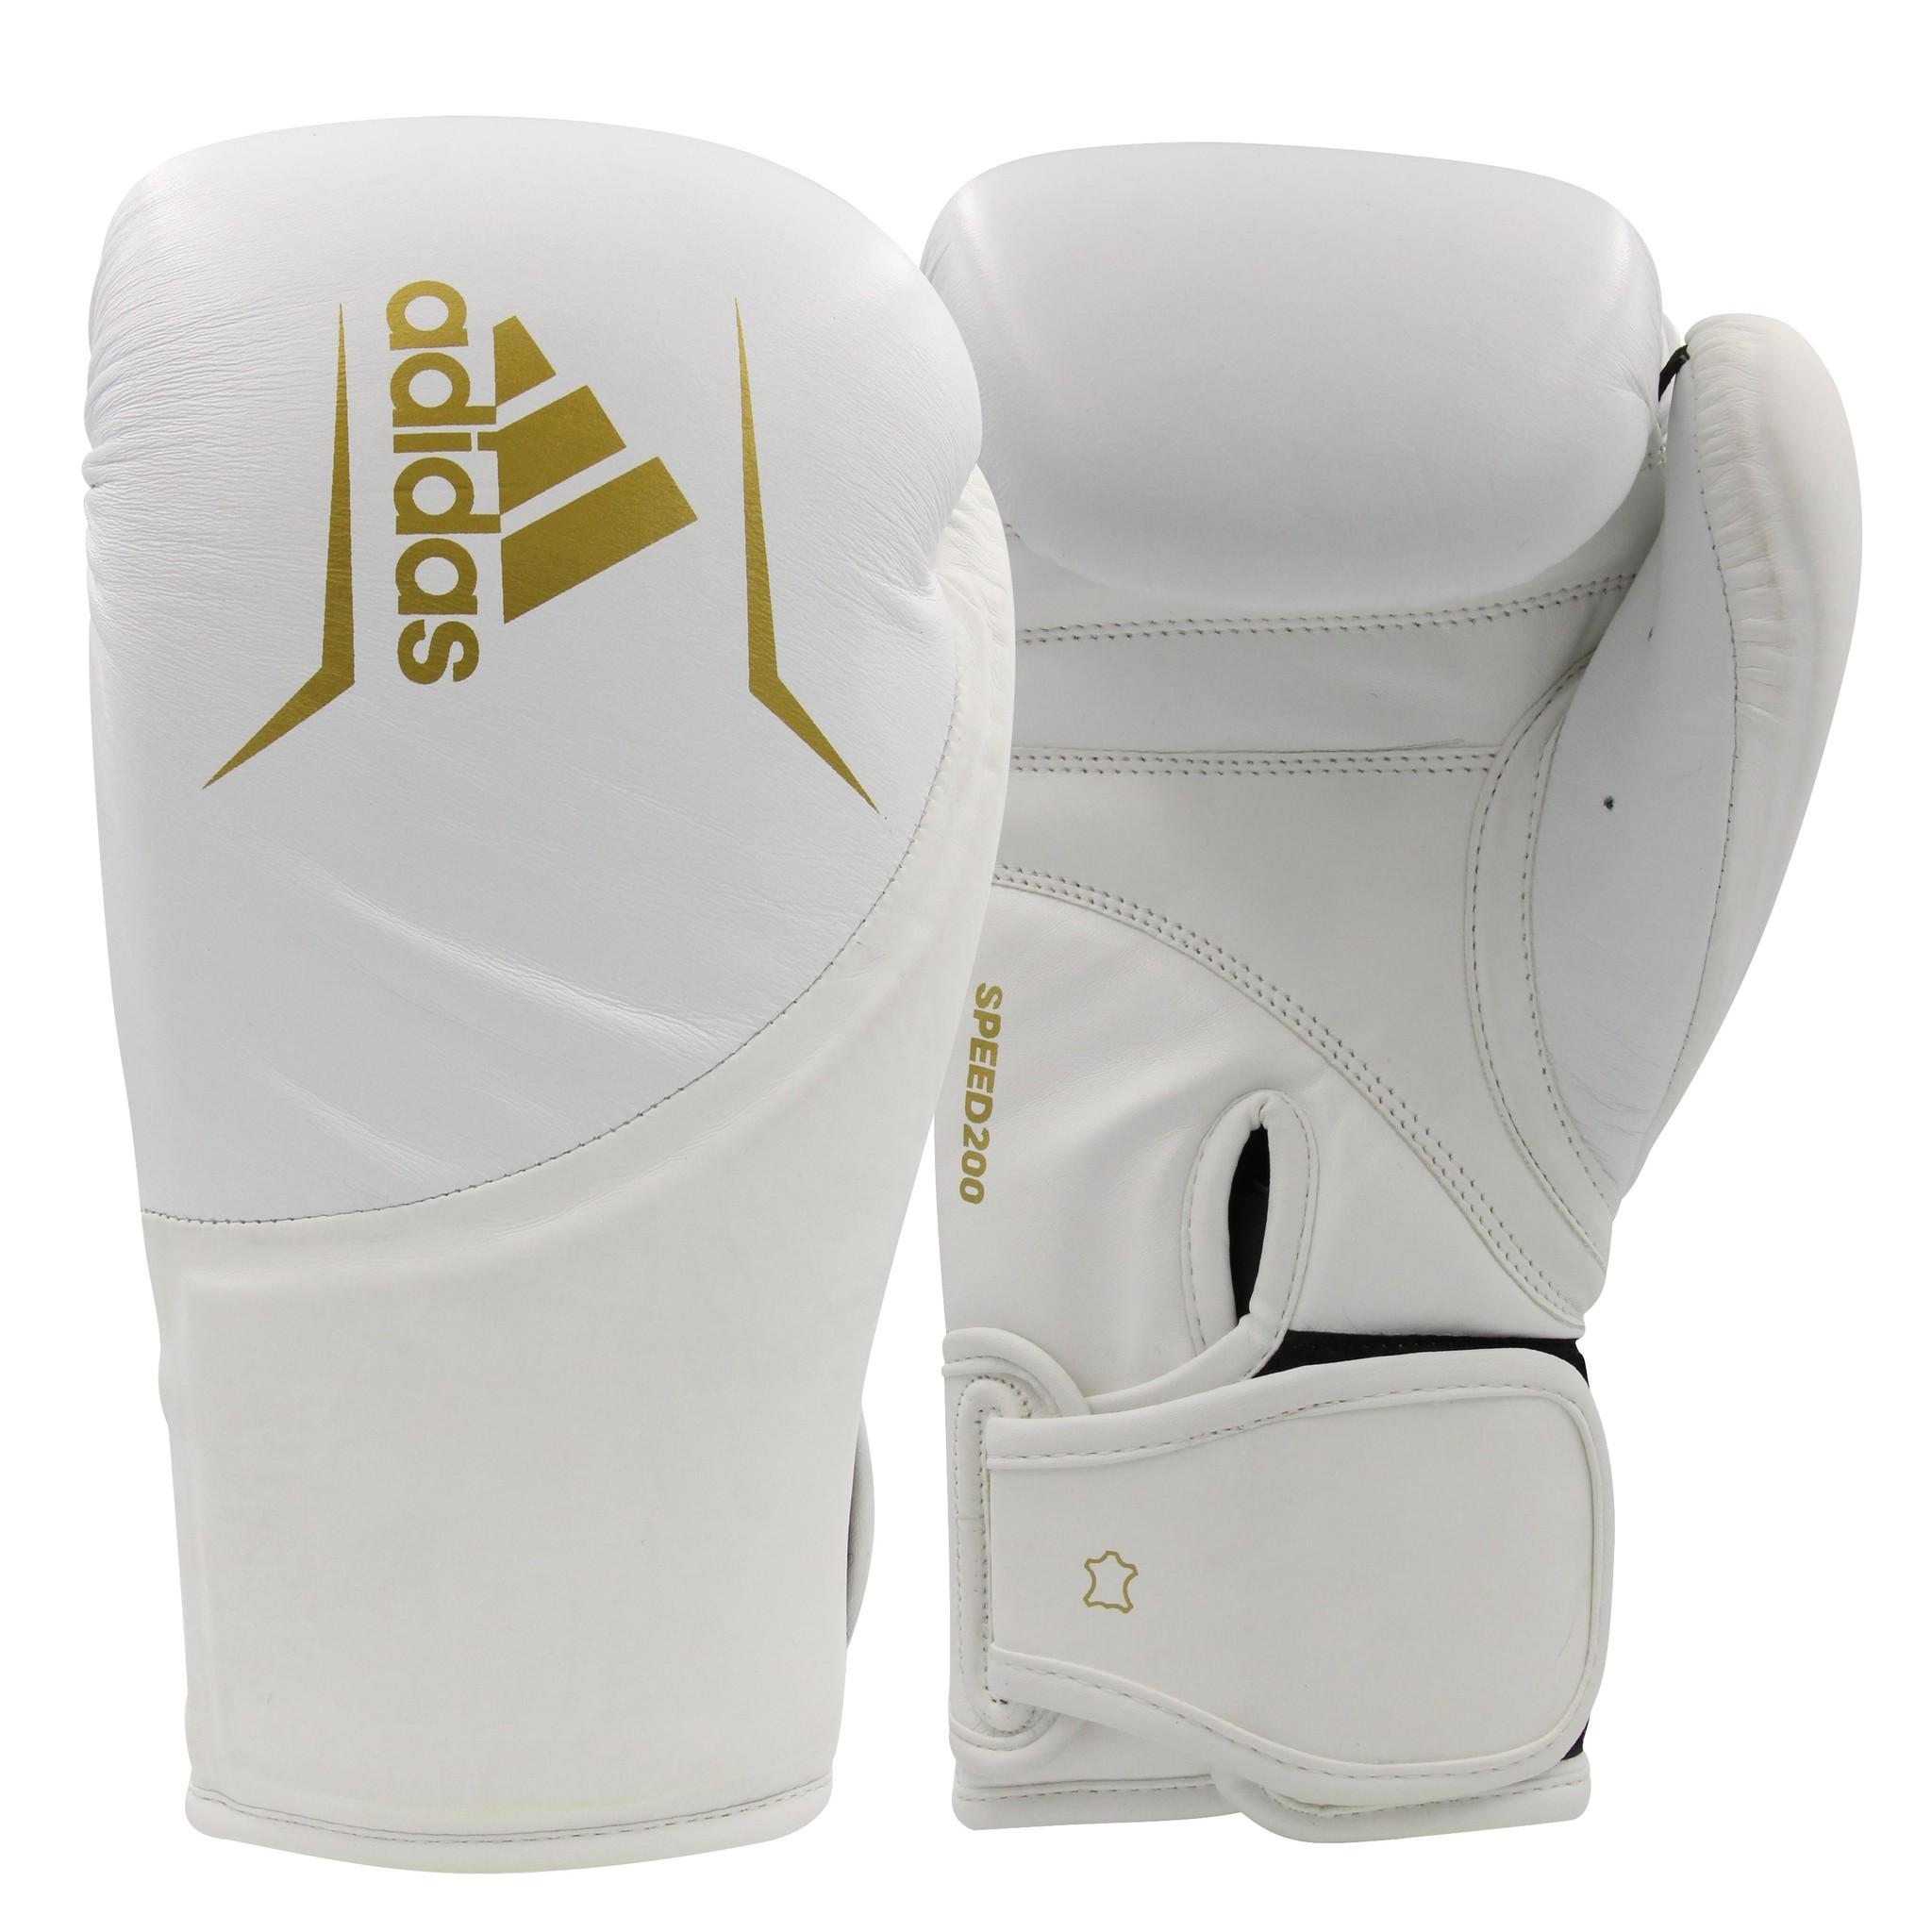 Adidas adidas Speed 200 (Kick)Bokshandschoenen Wit/Goud